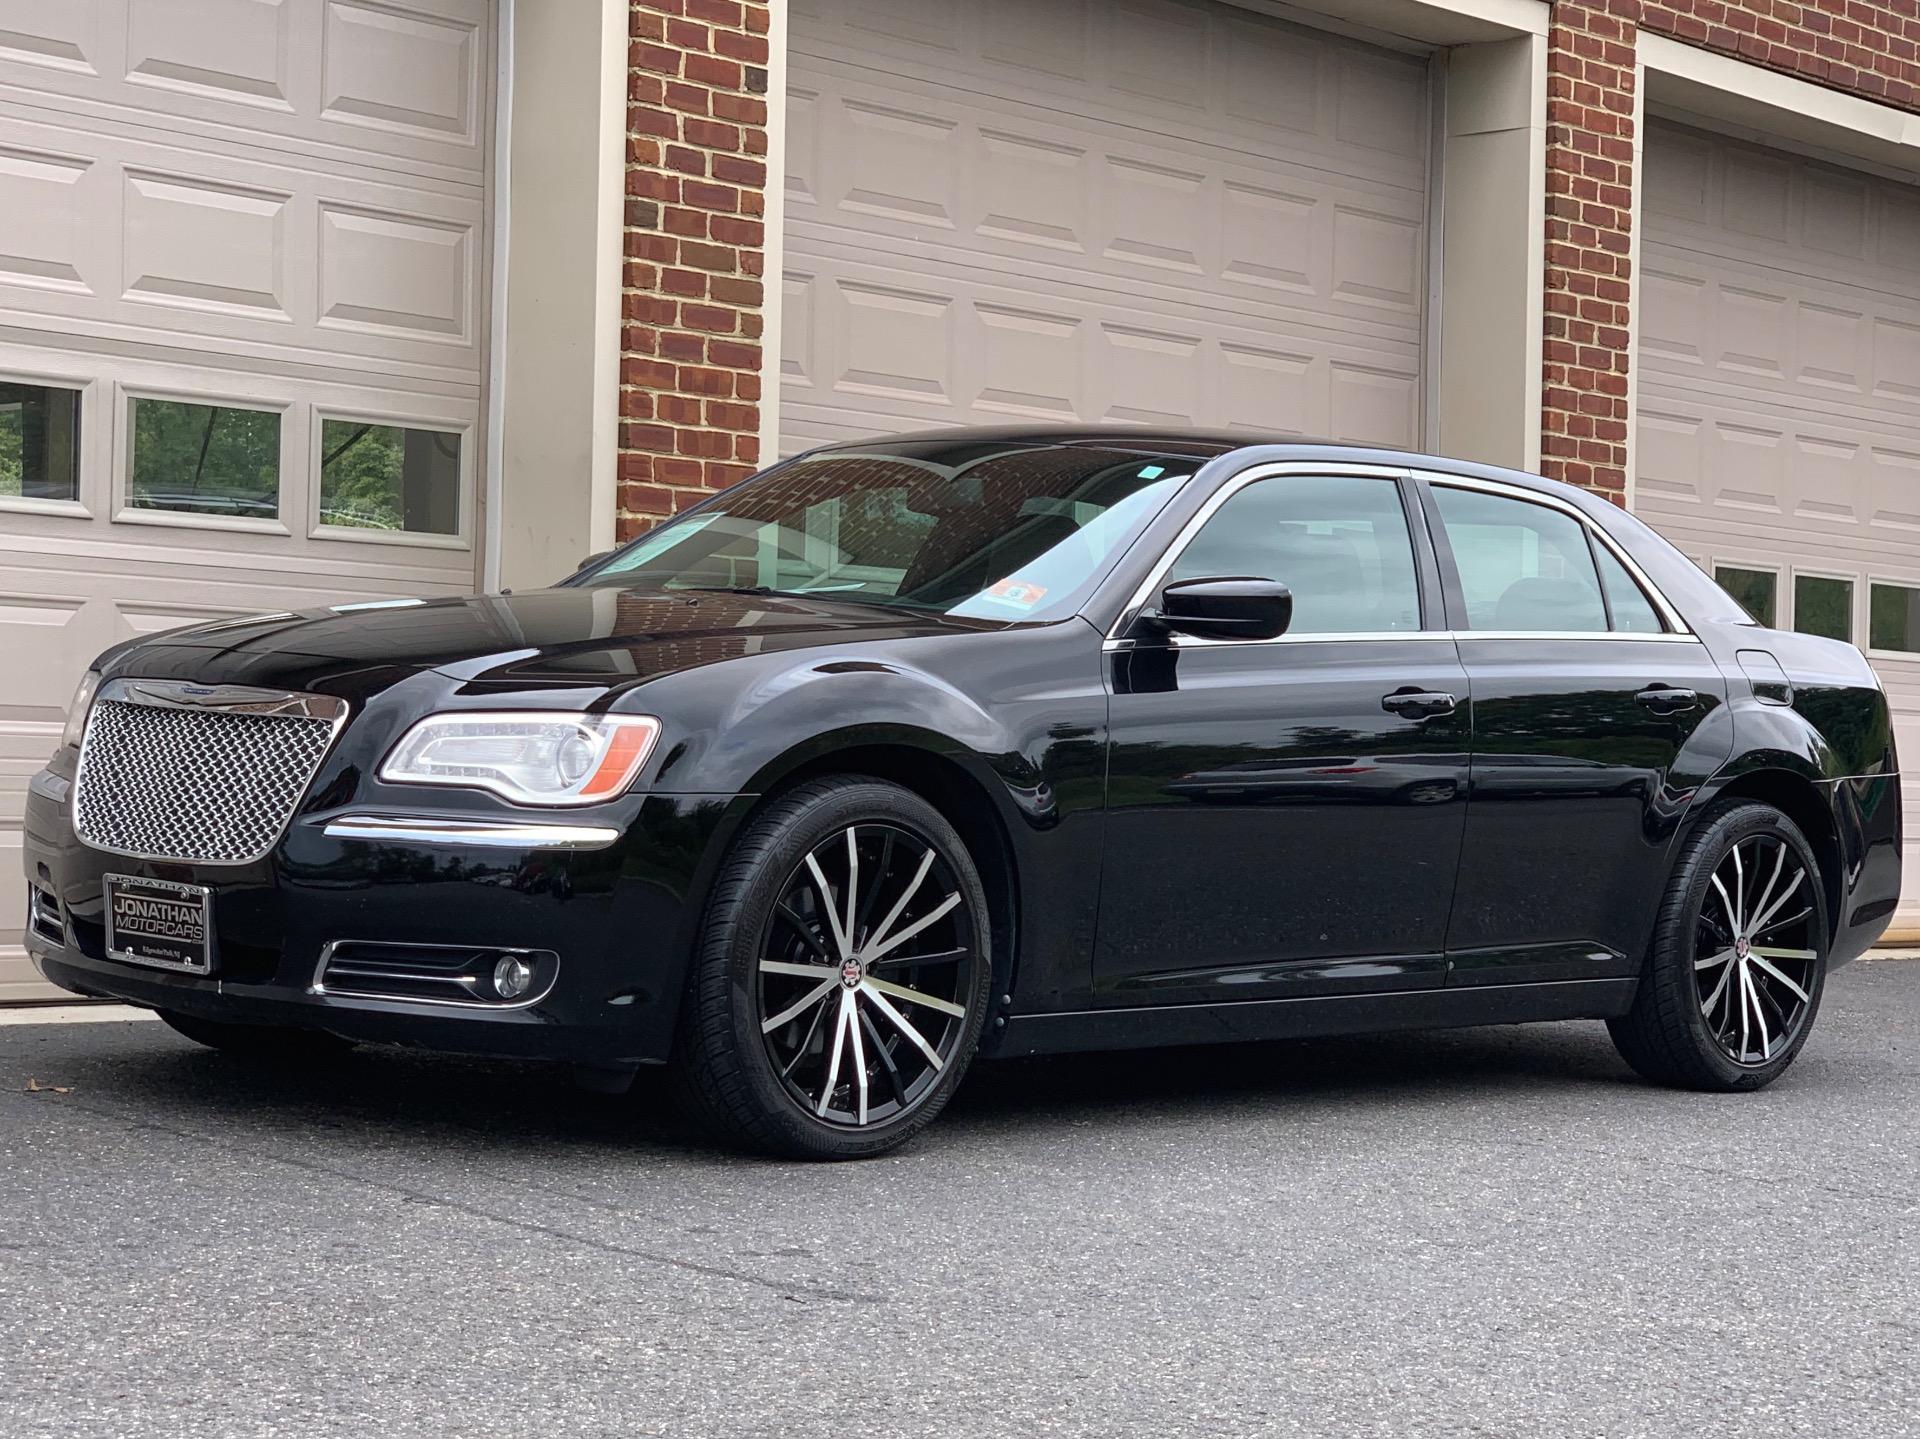 Used-2013-Chrysler-300-Preferred-Package-22F